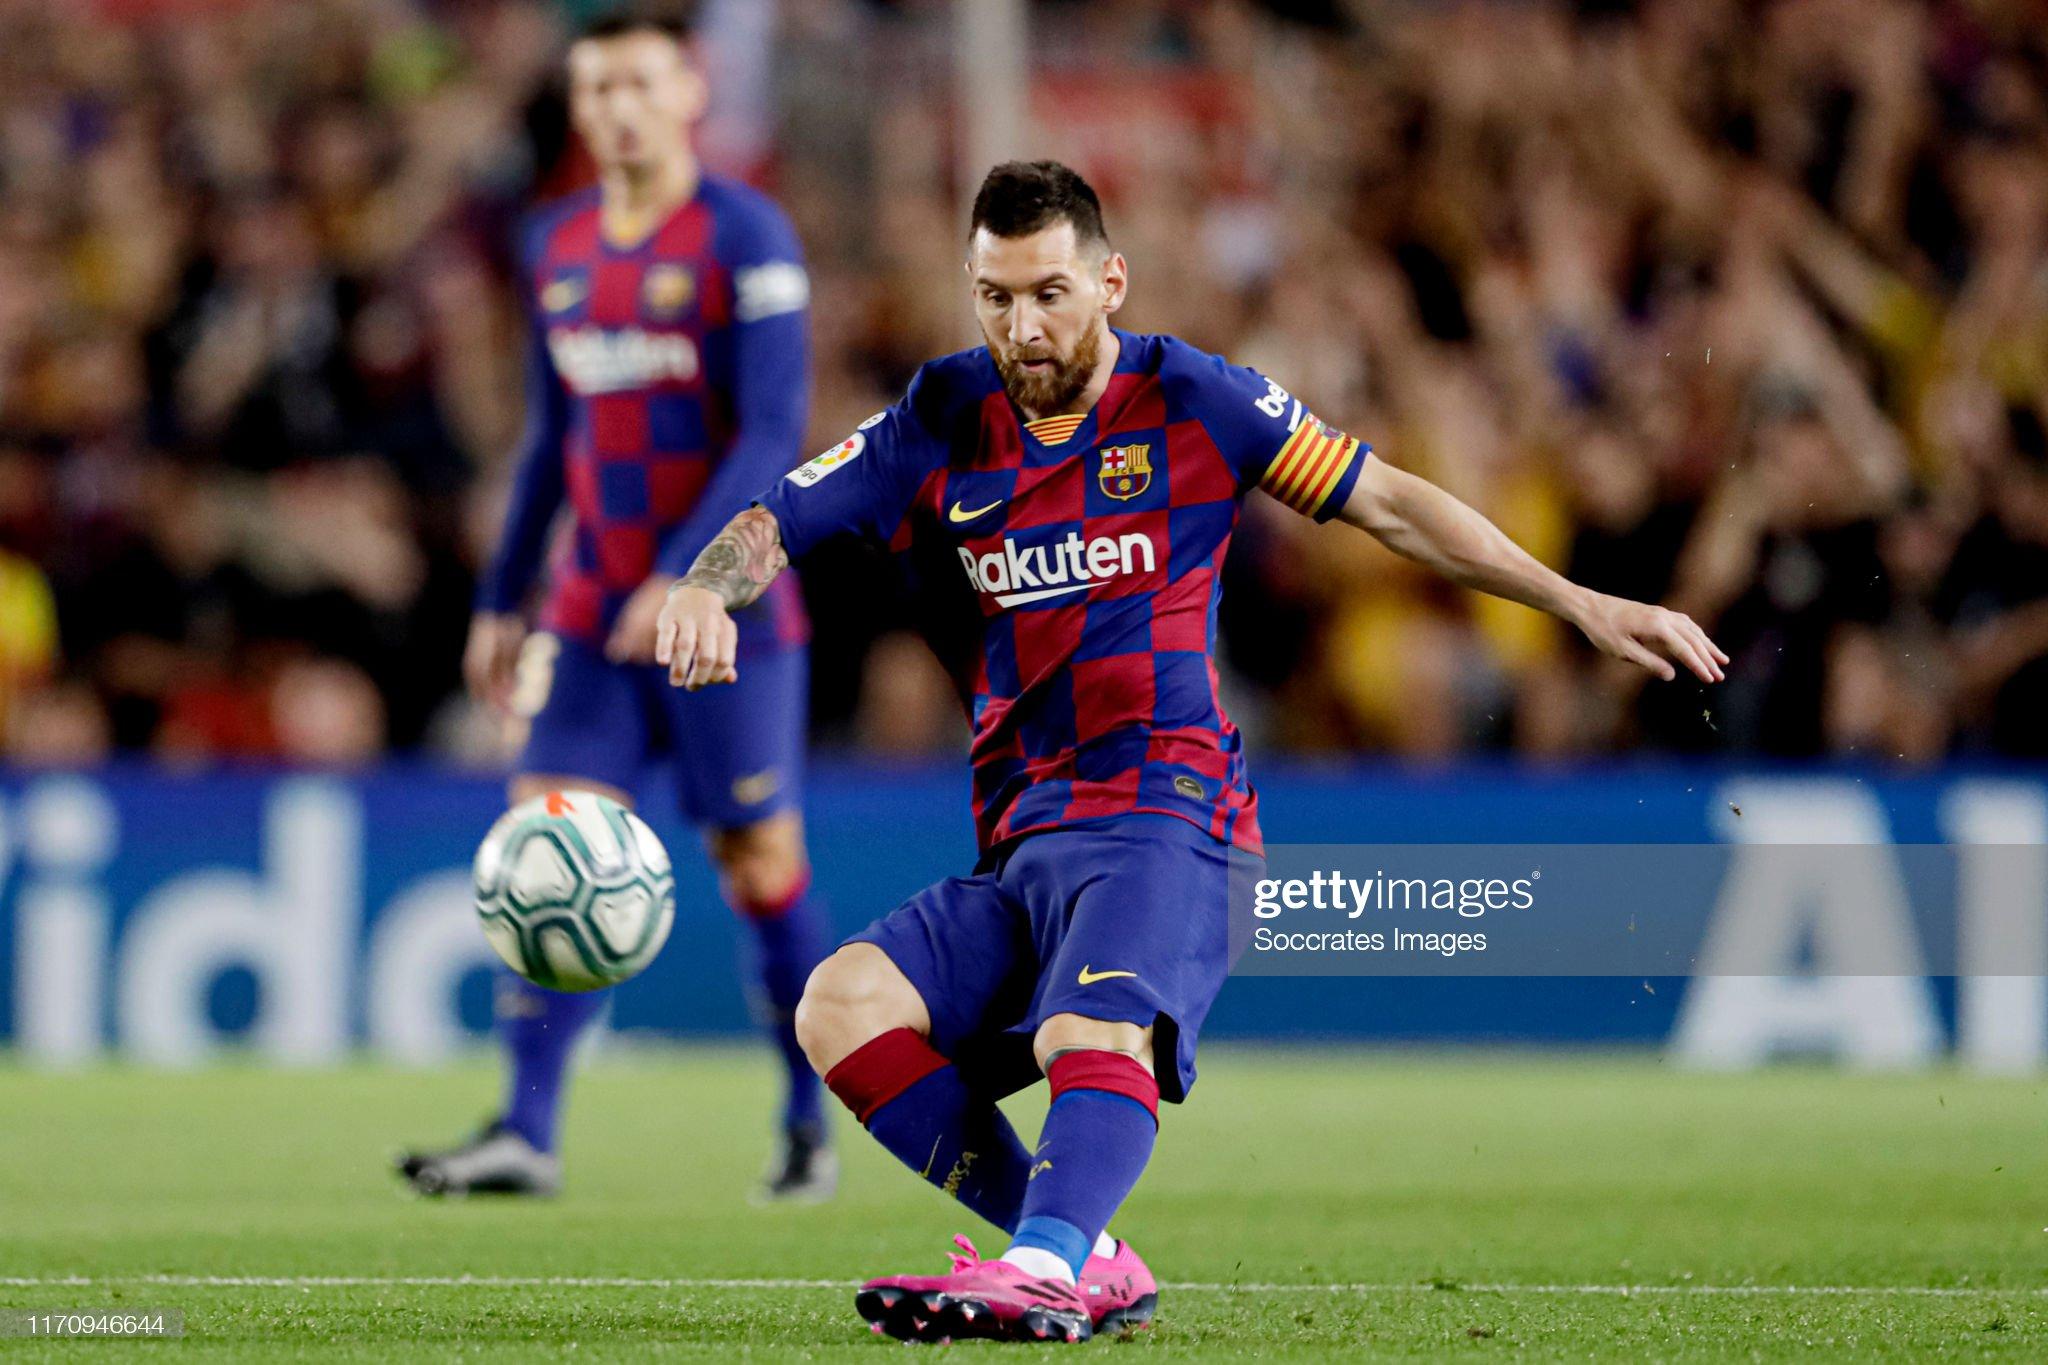 صور مباراة : برشلونة - فياريال 2-1 ( 24-09-2019 )  Lionel-messi-of-fc-barcelona-during-the-la-liga-santander-match-fc-picture-id1170946644?s=2048x2048